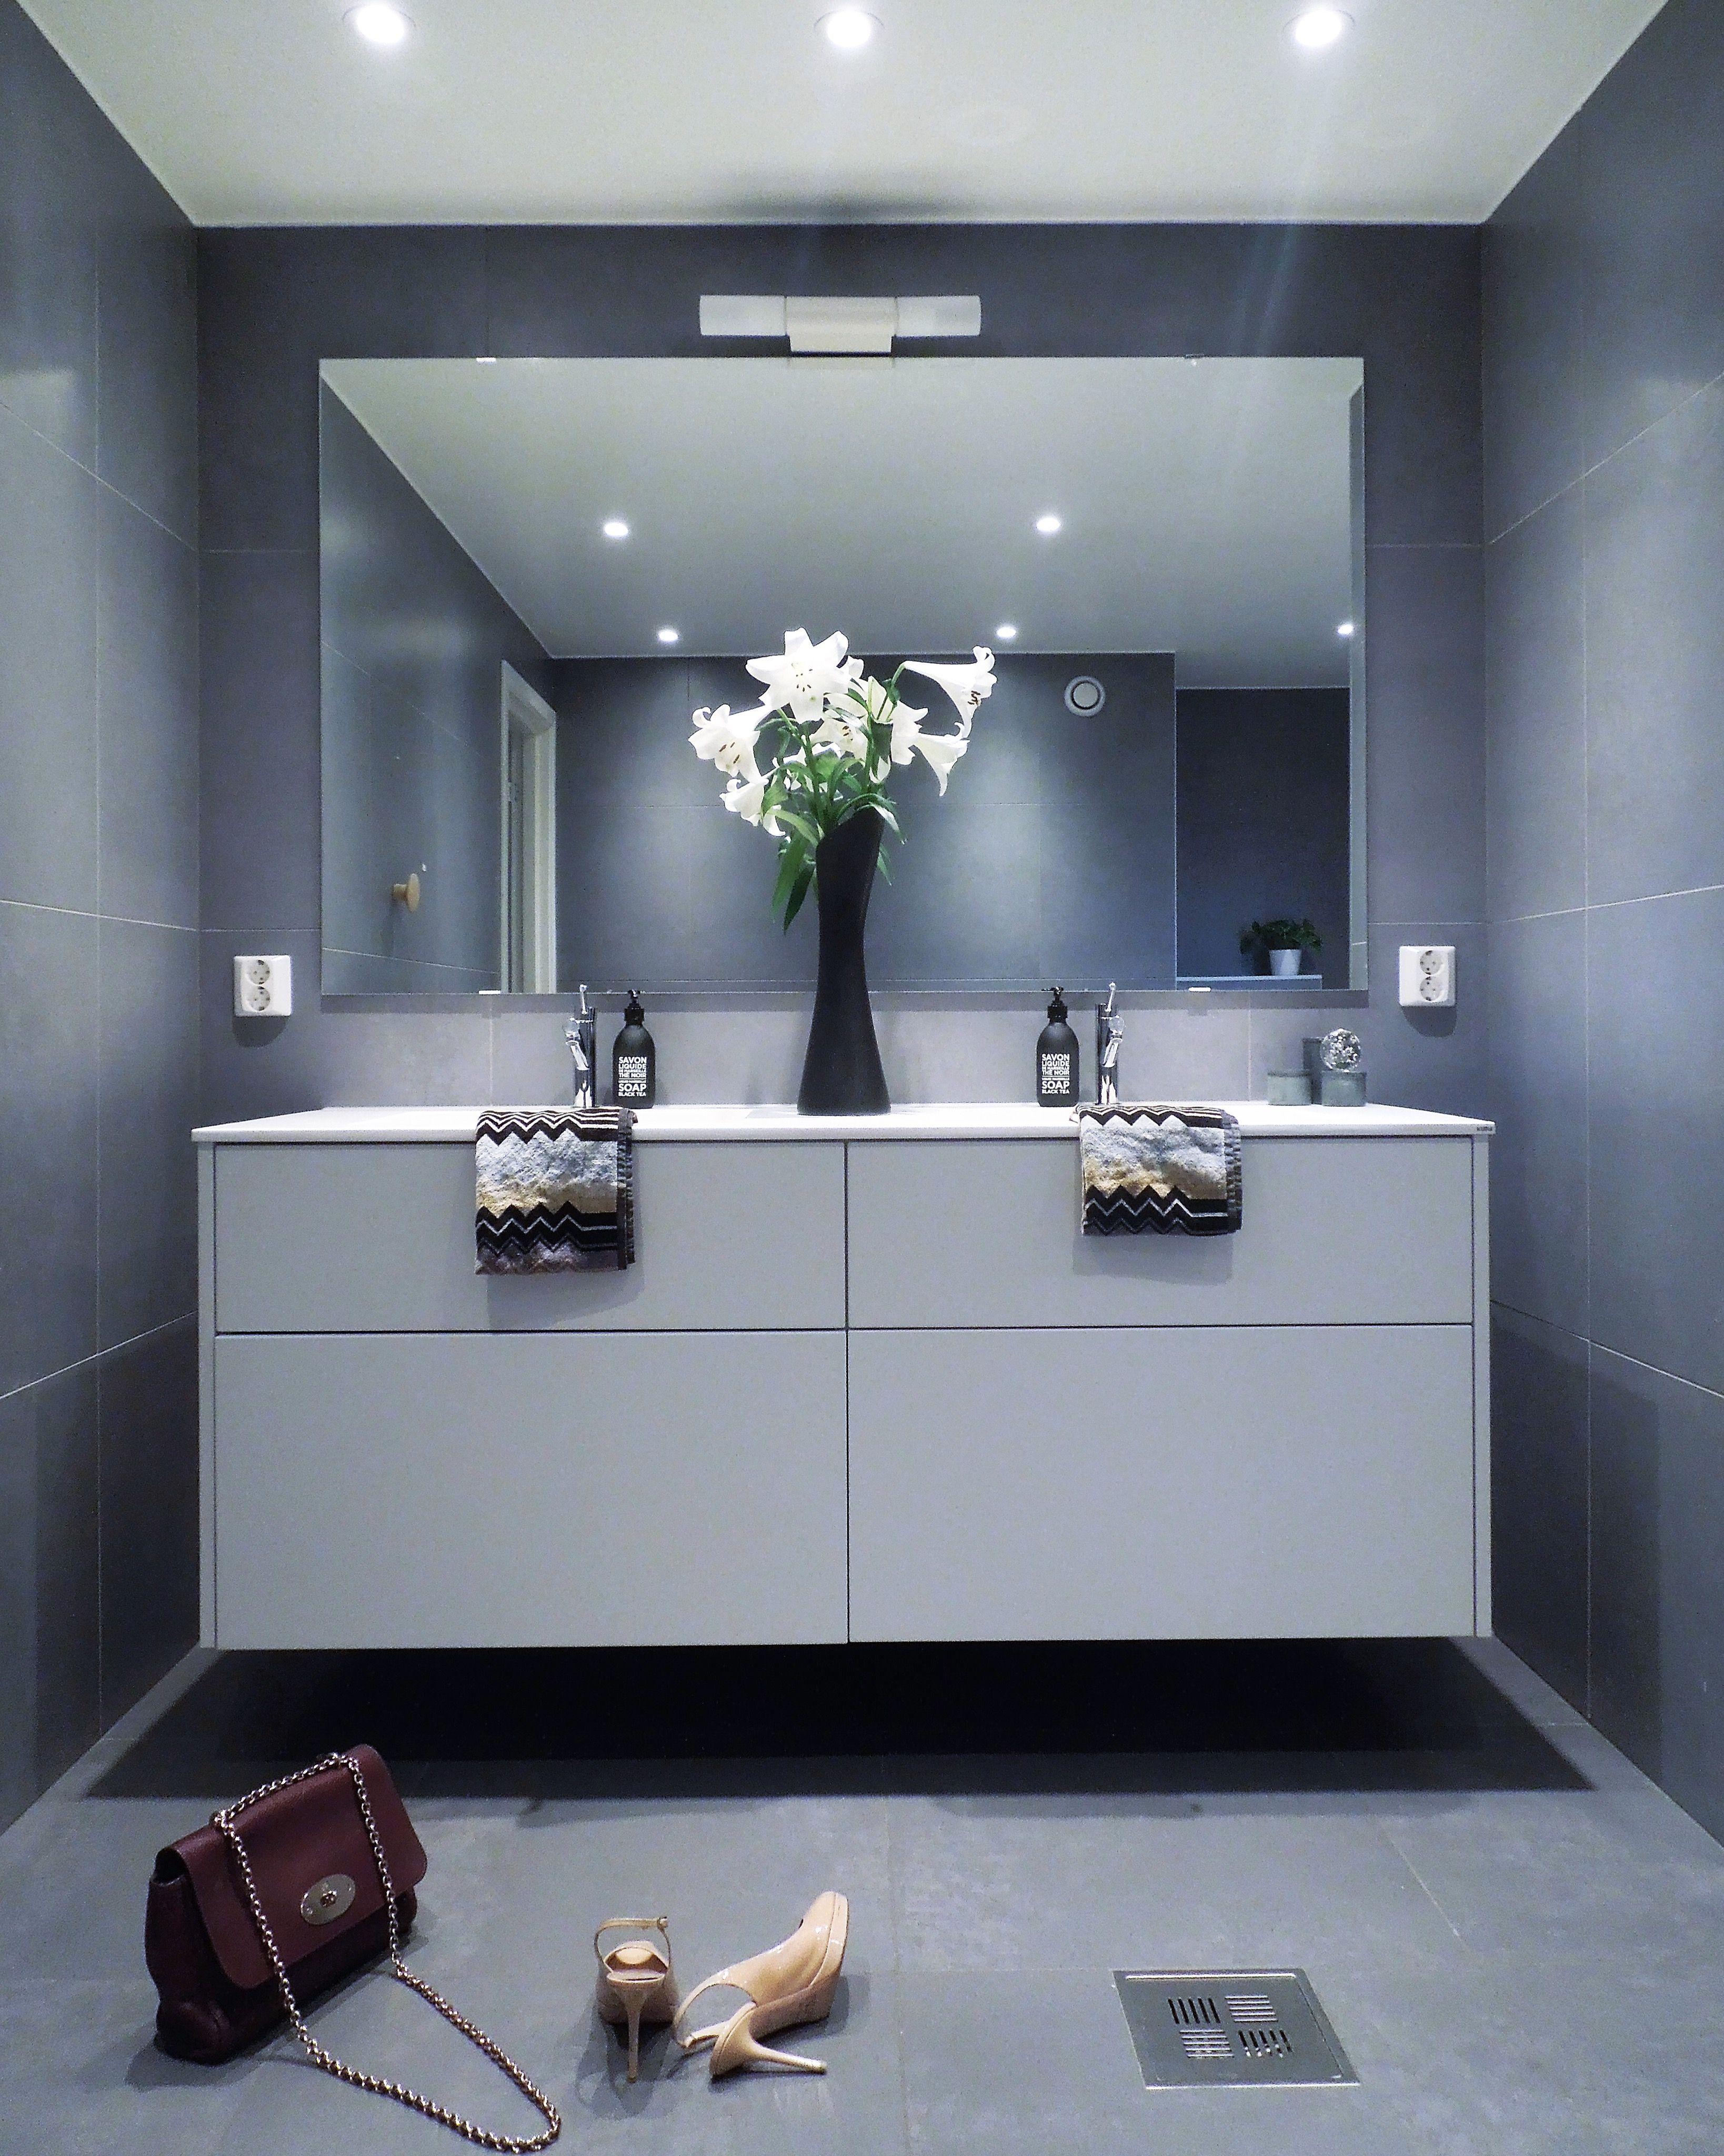 bathroom by @frutanem on #instagram | my own photos ig @frutanem, Badezimmer ideen